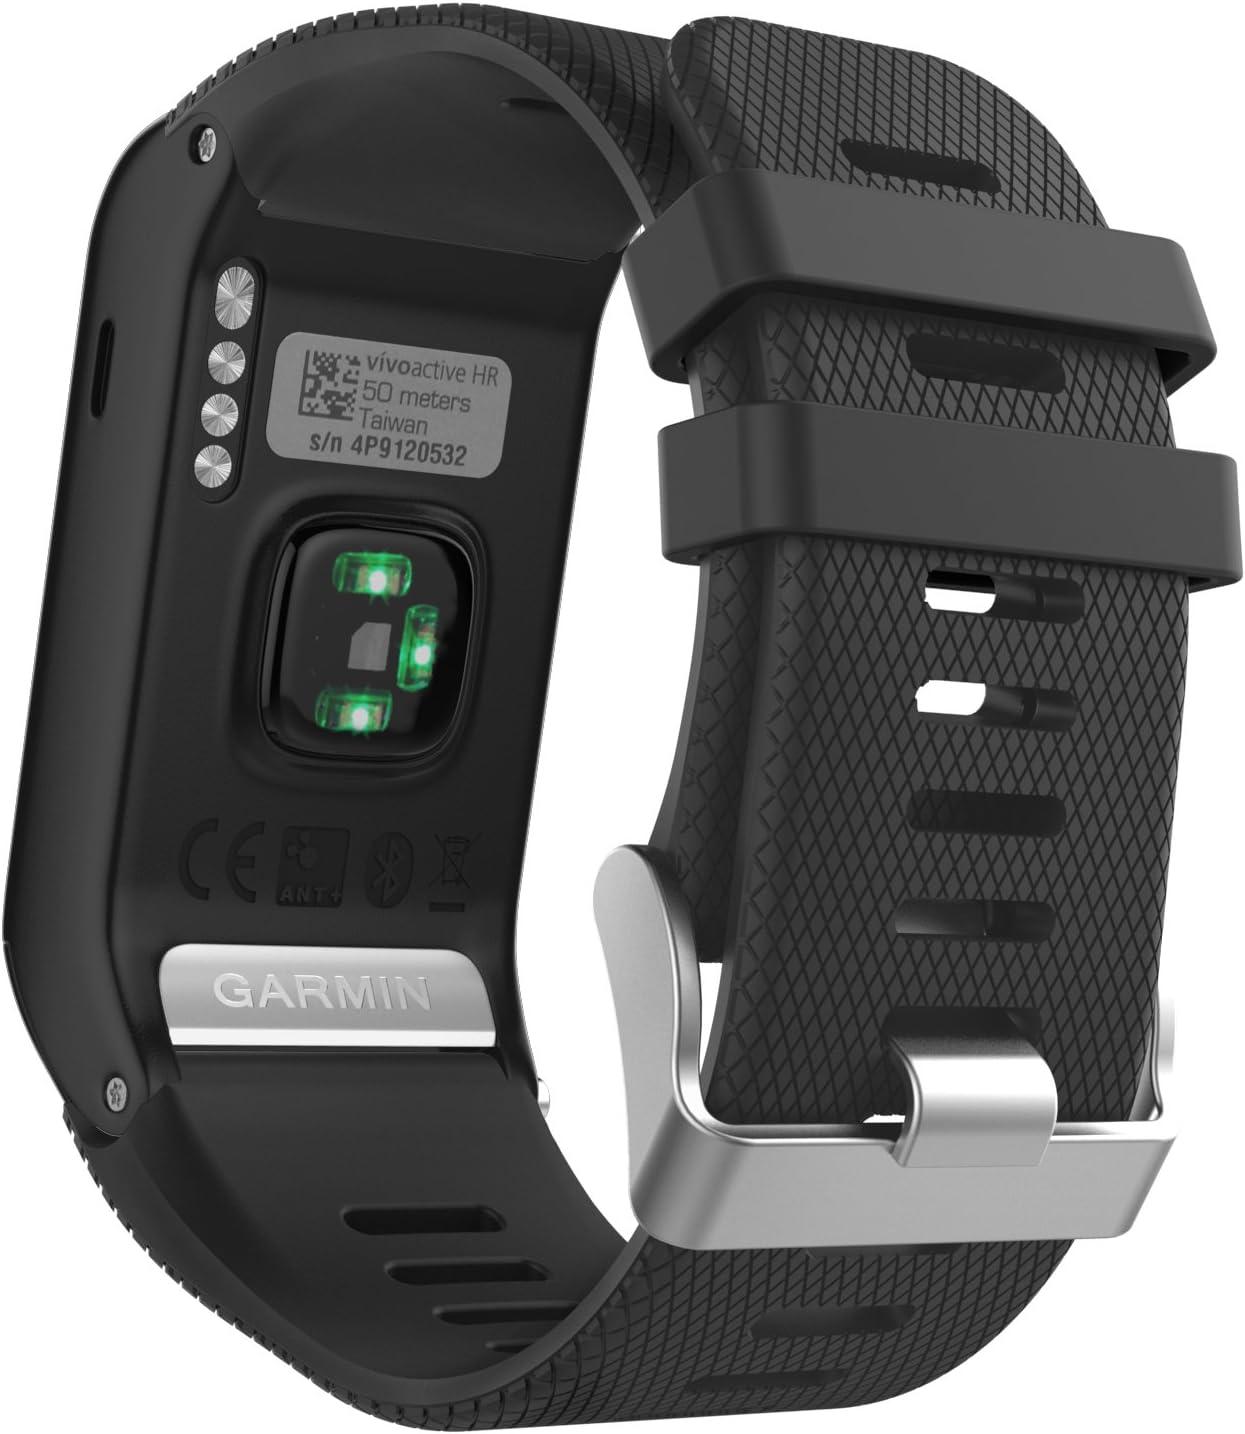 Garmin Vivoactive HR Watch Band